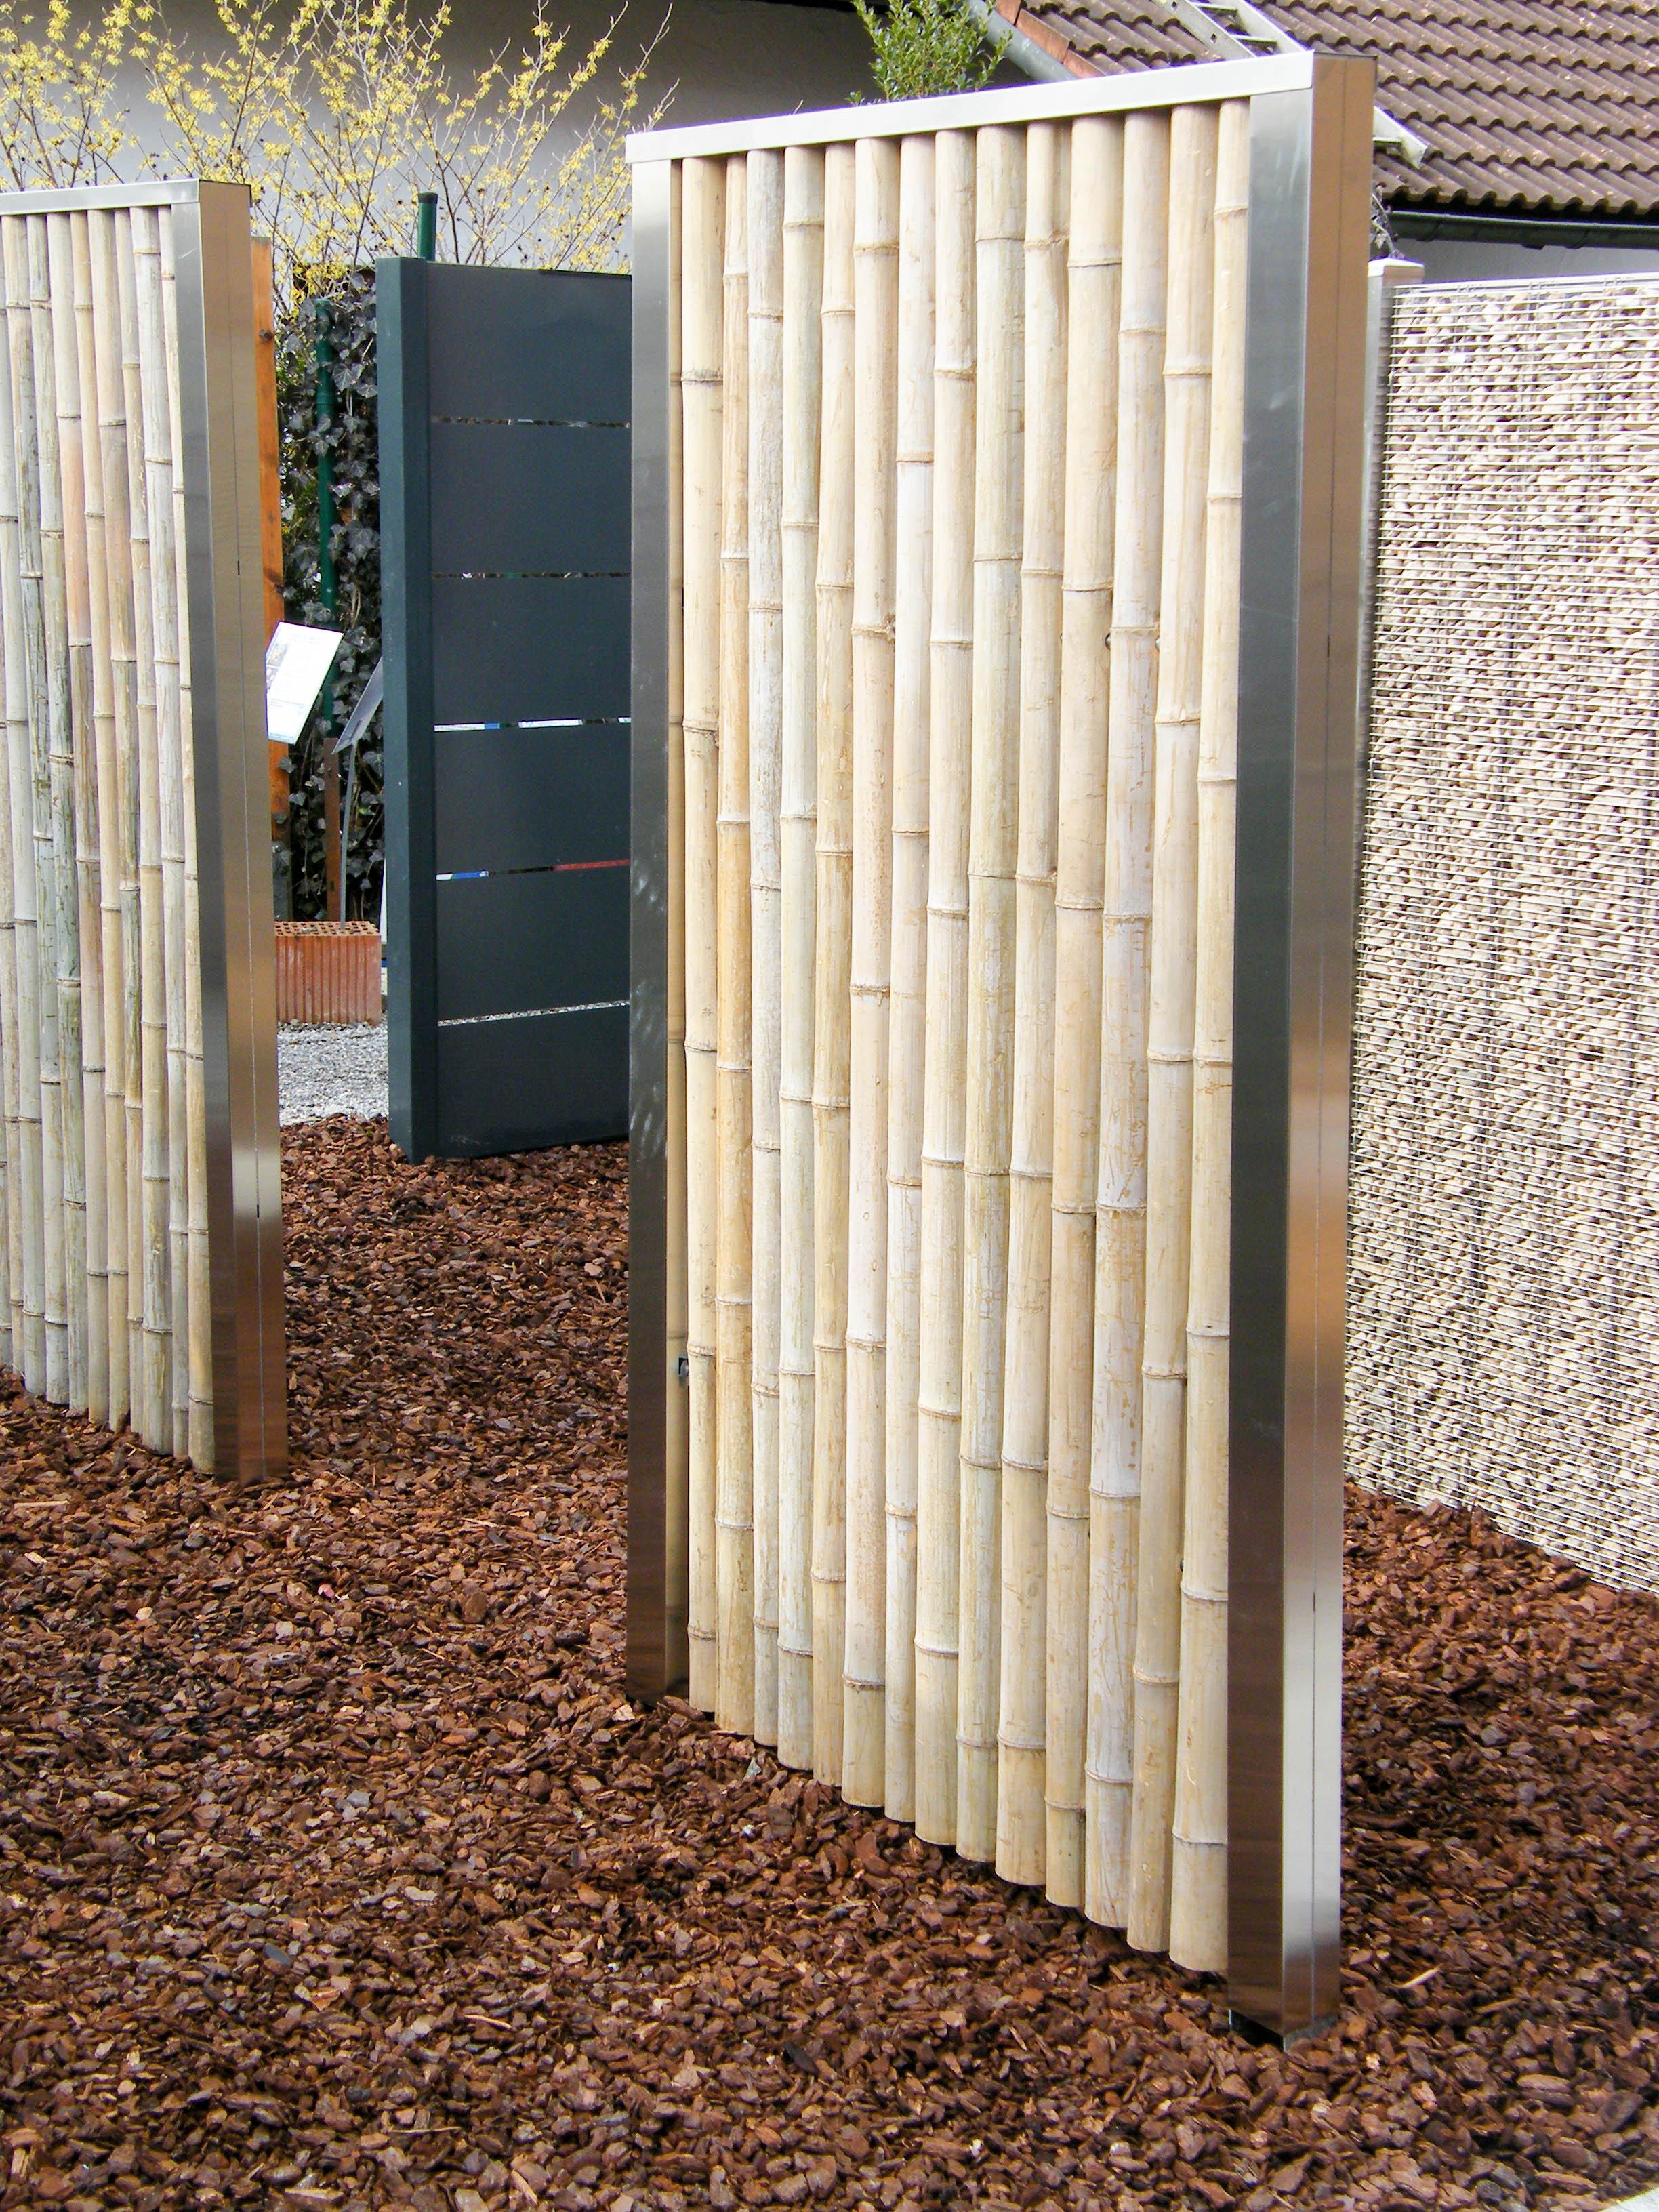 bambus sichtschutz 180 x 90 cm. Black Bedroom Furniture Sets. Home Design Ideas